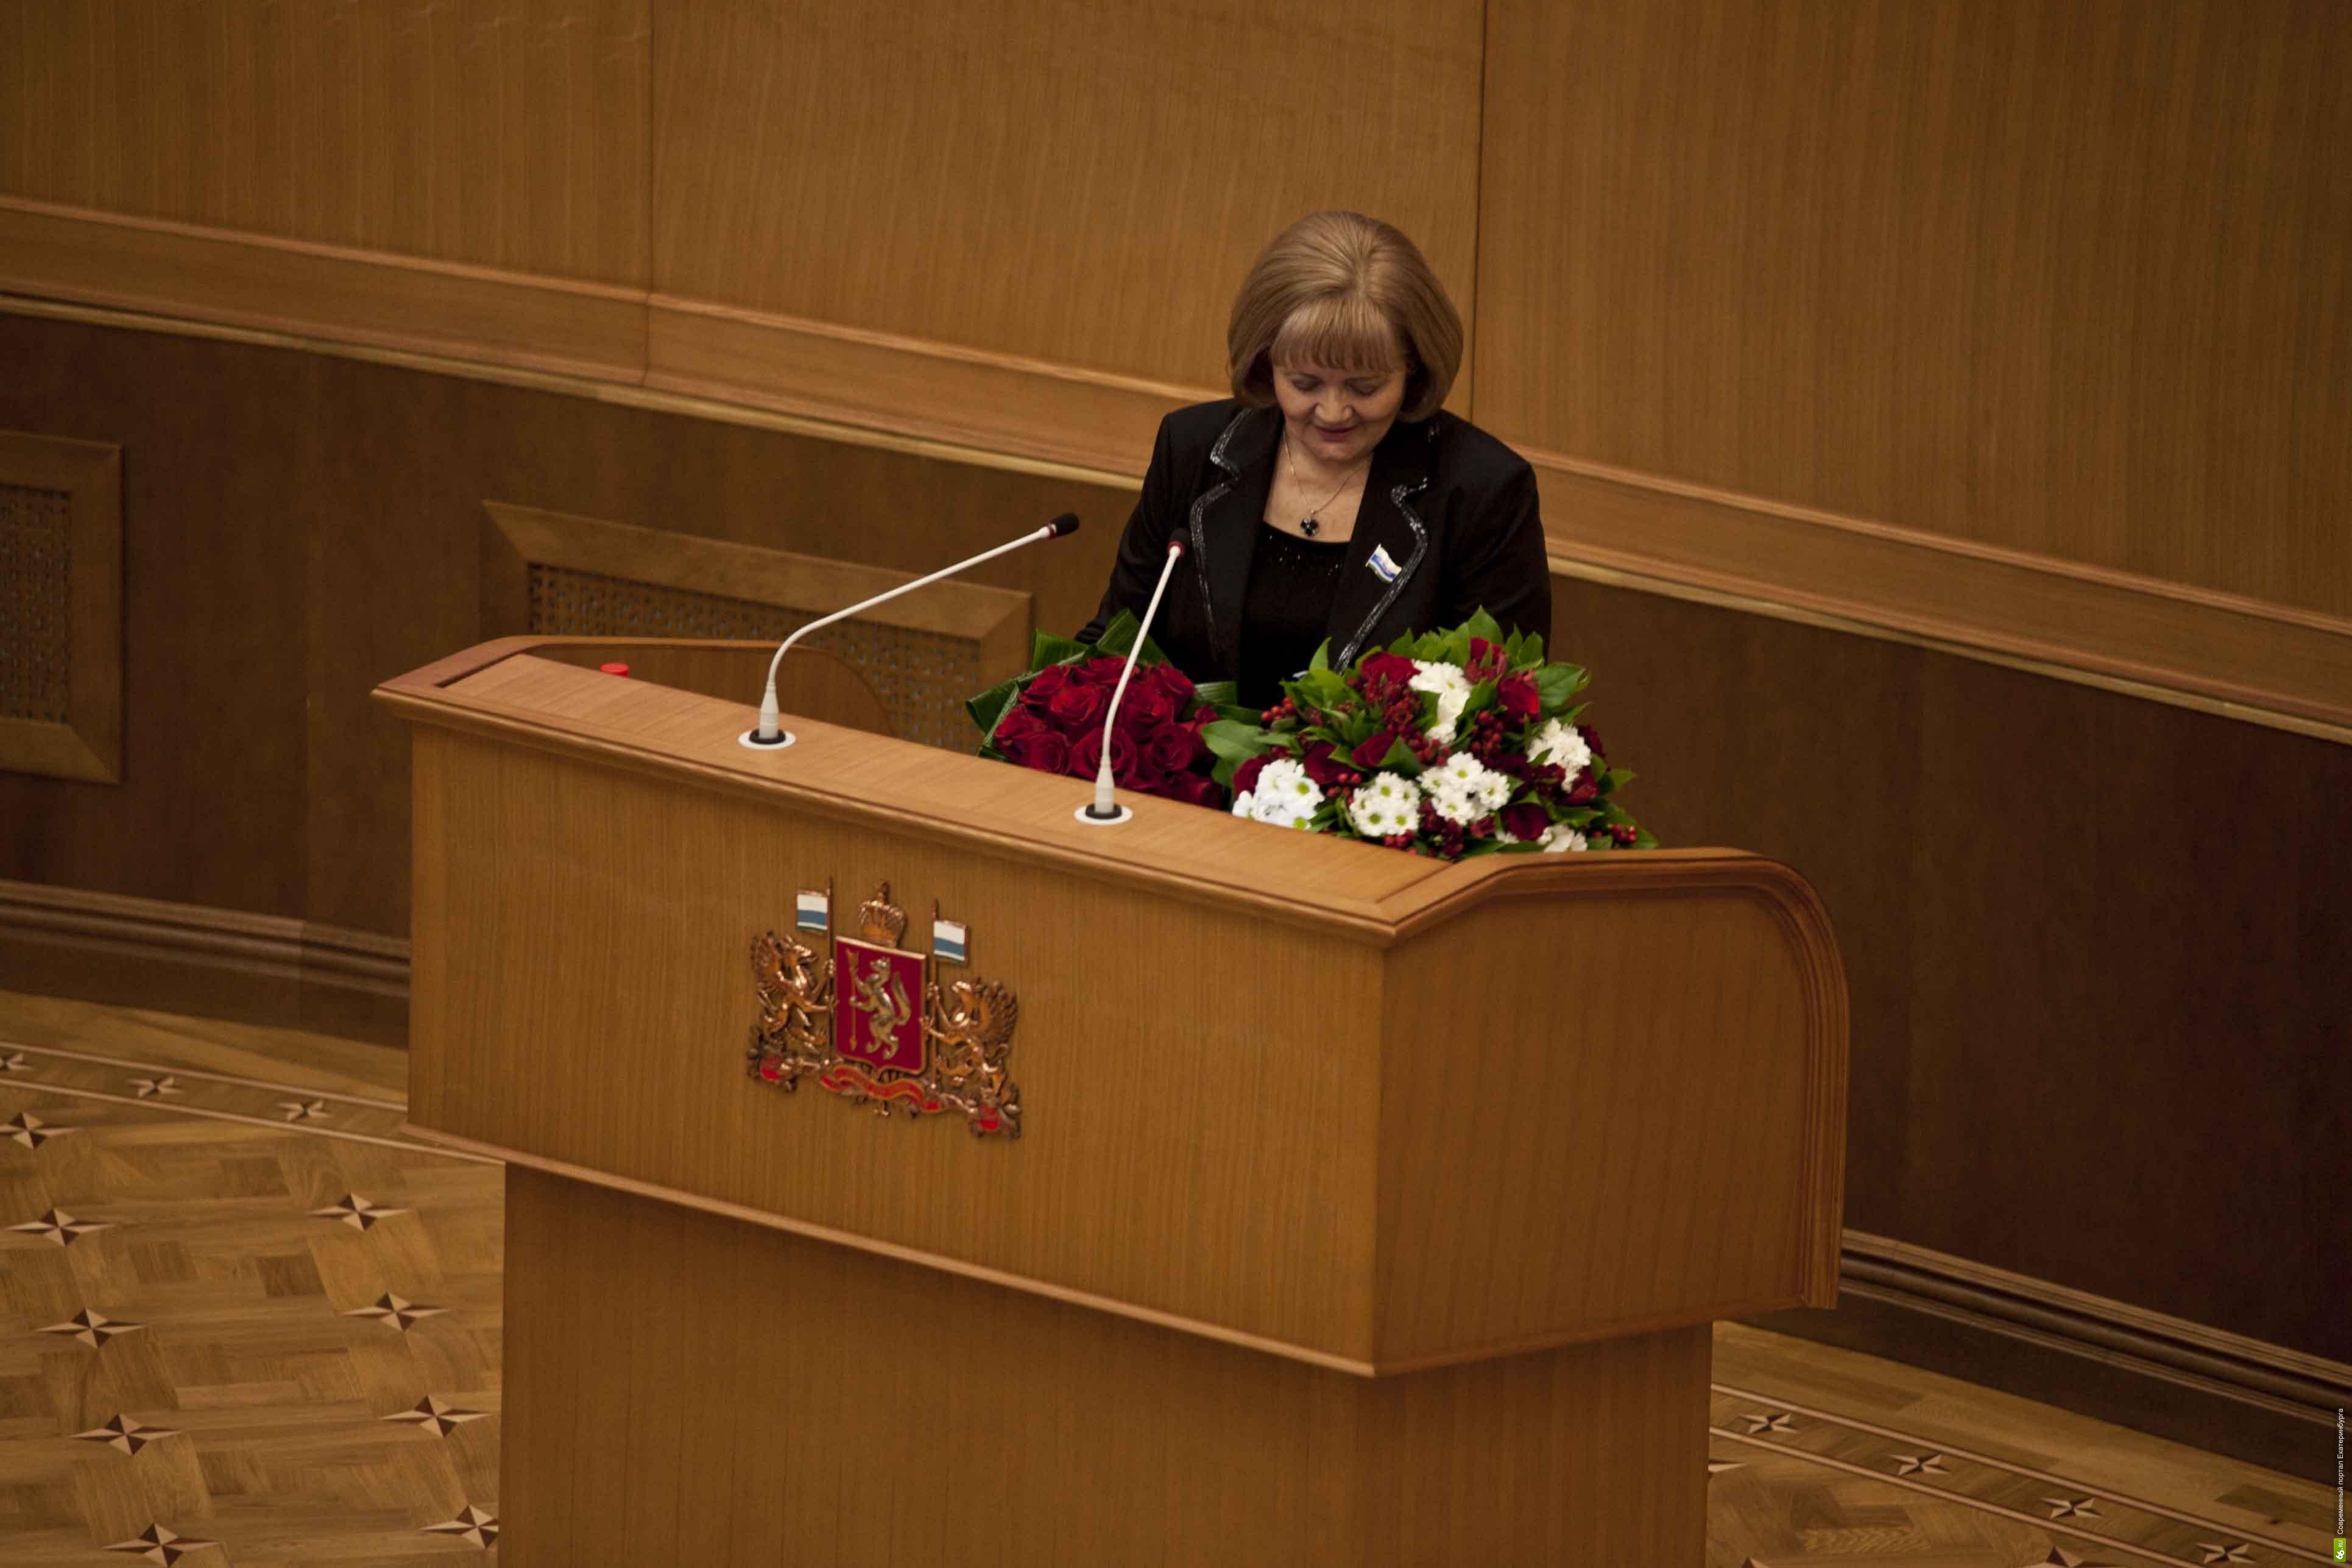 Людмила Бабушкина получила награду от Владимира Путина